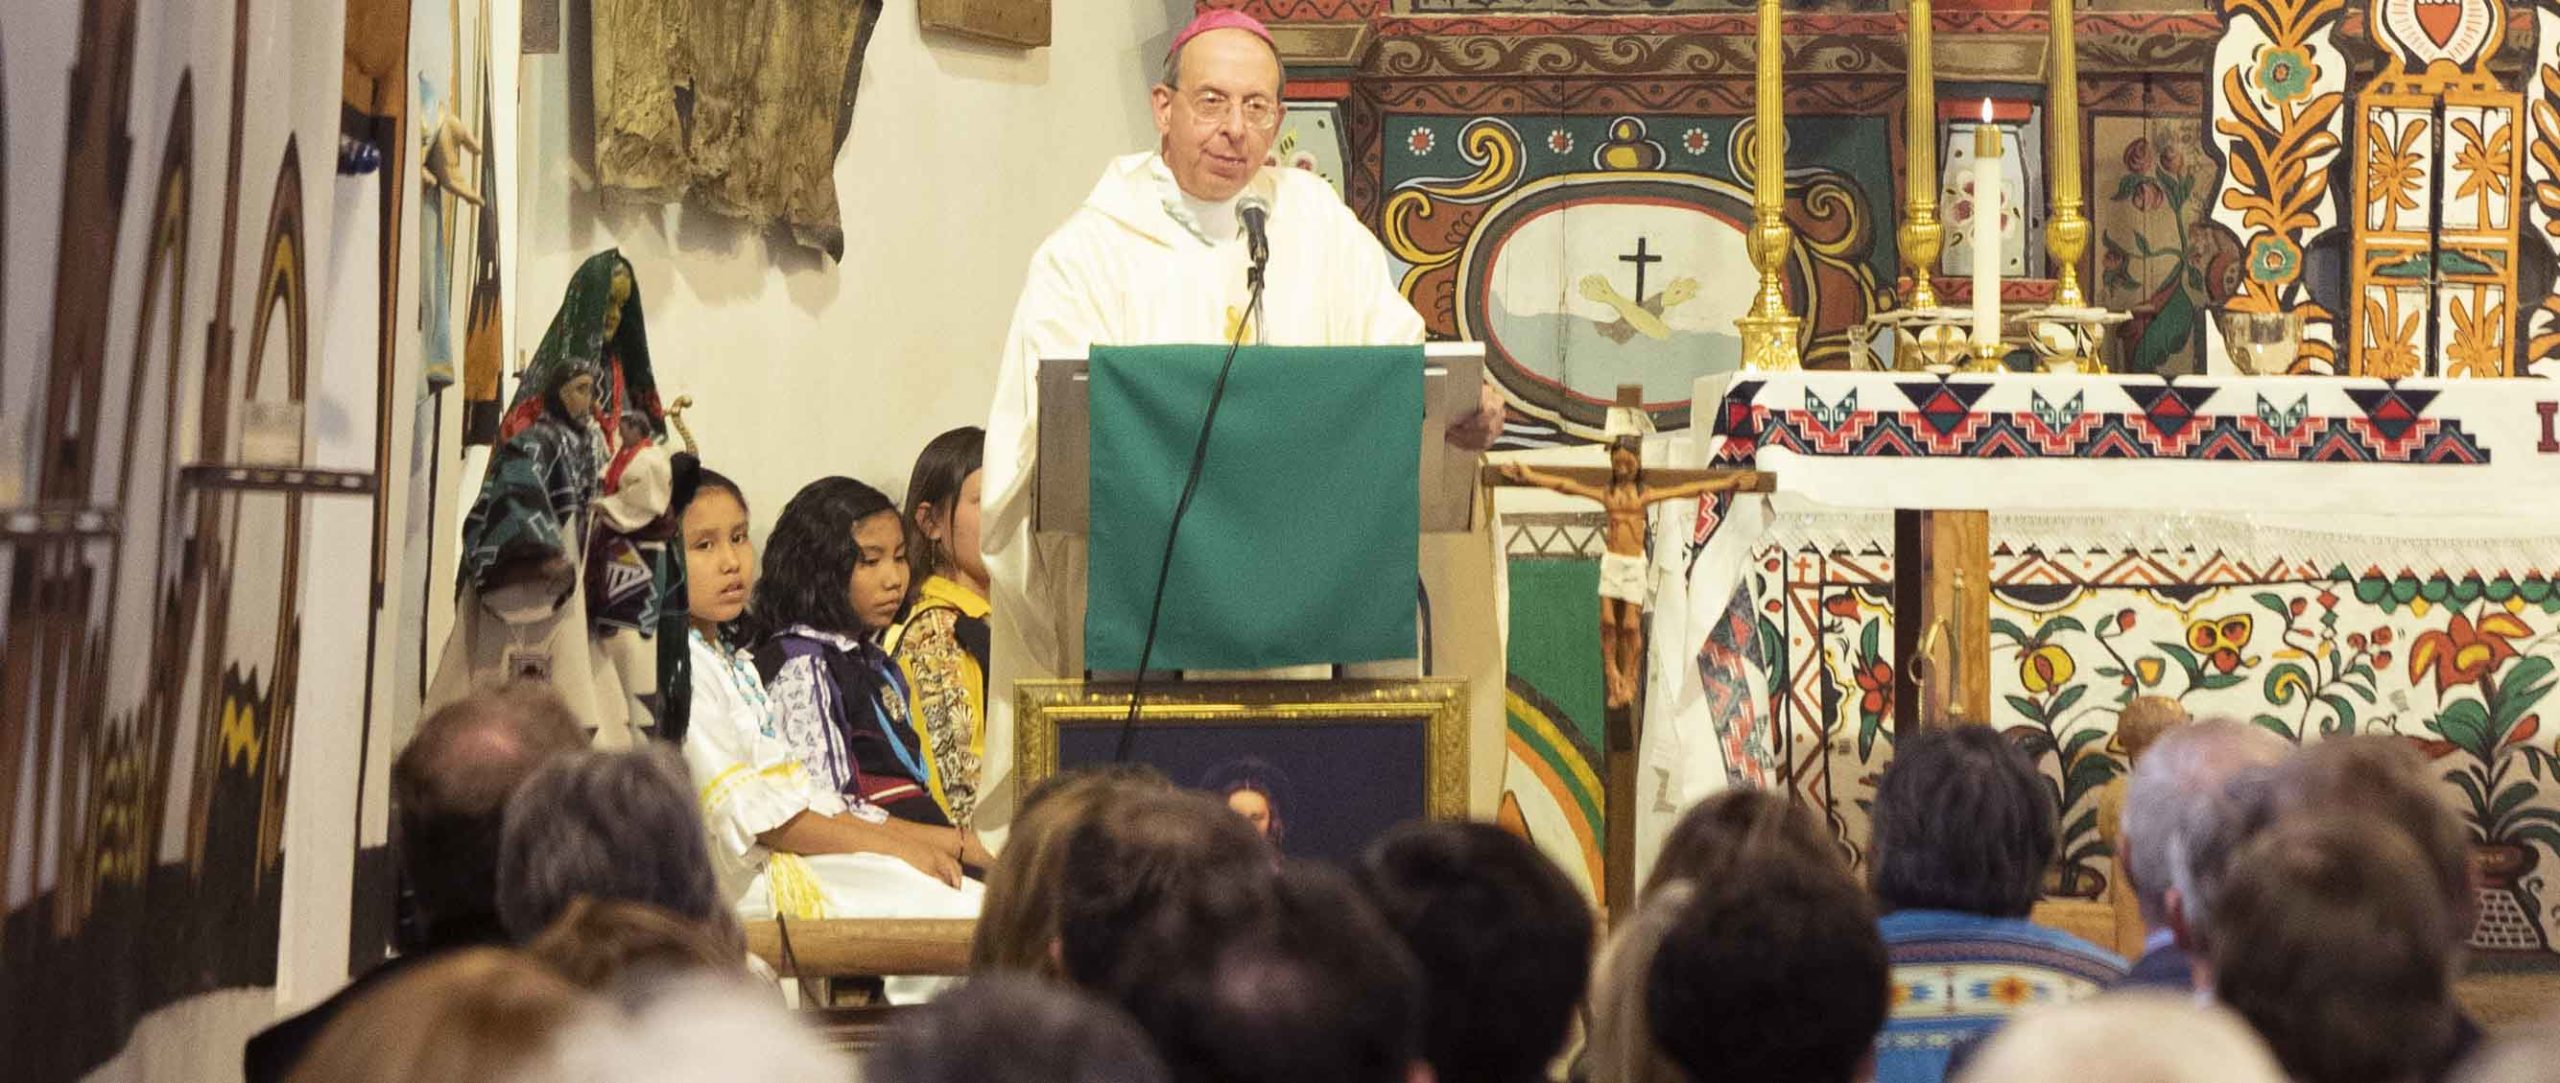 Laguna people are example of perseverance in faith, Archbishop Lori says